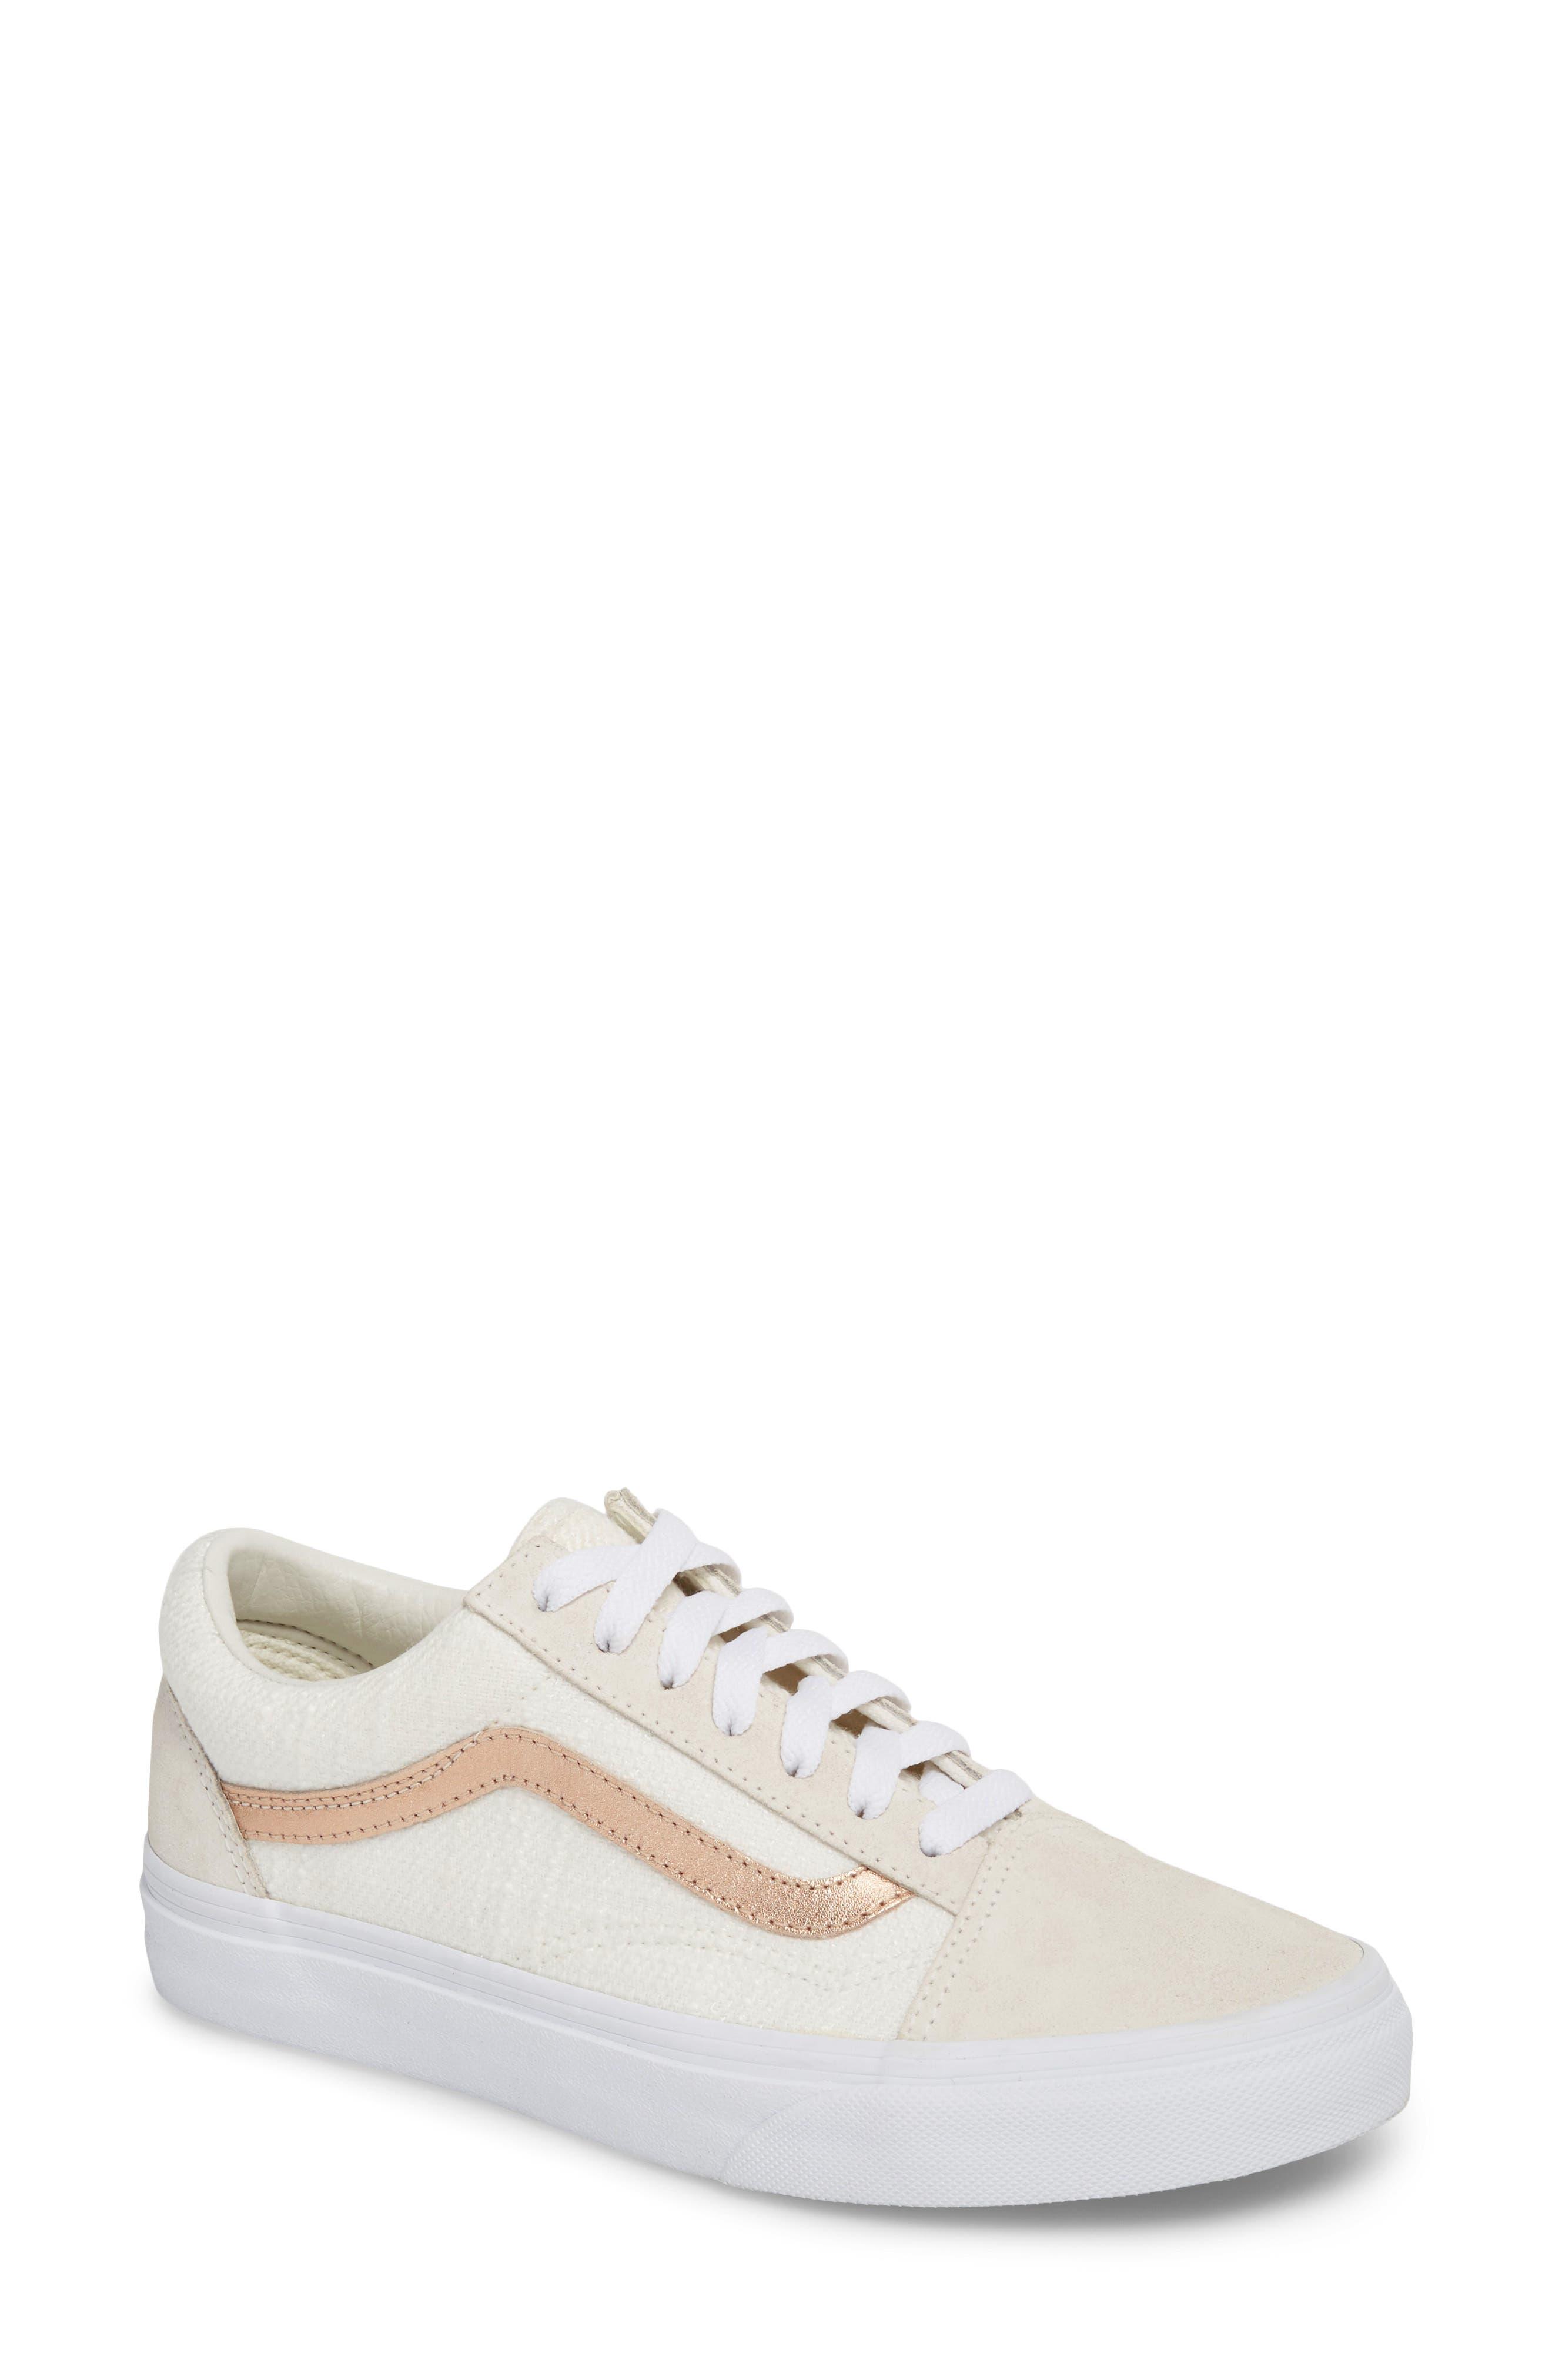 Old Skool Sneaker,                             Main thumbnail 1, color,                             Blanc De Blanc/ Rose Gold